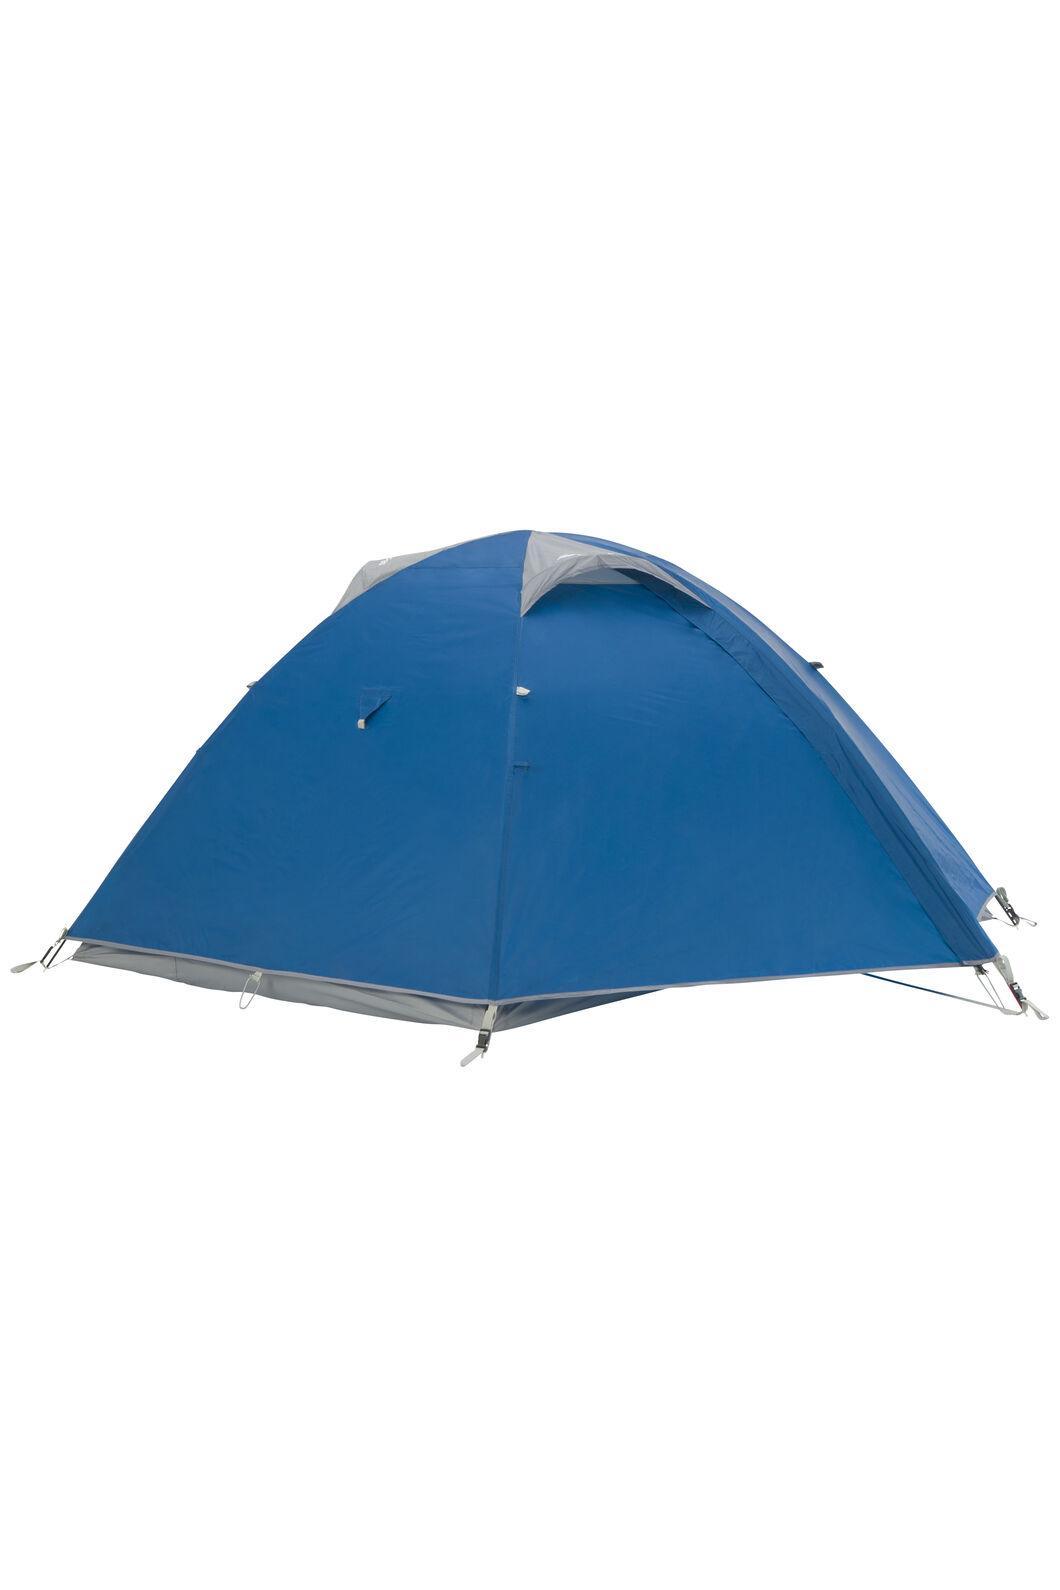 Macpac Polaris Camping Tent, Imperial Blue, hi-res